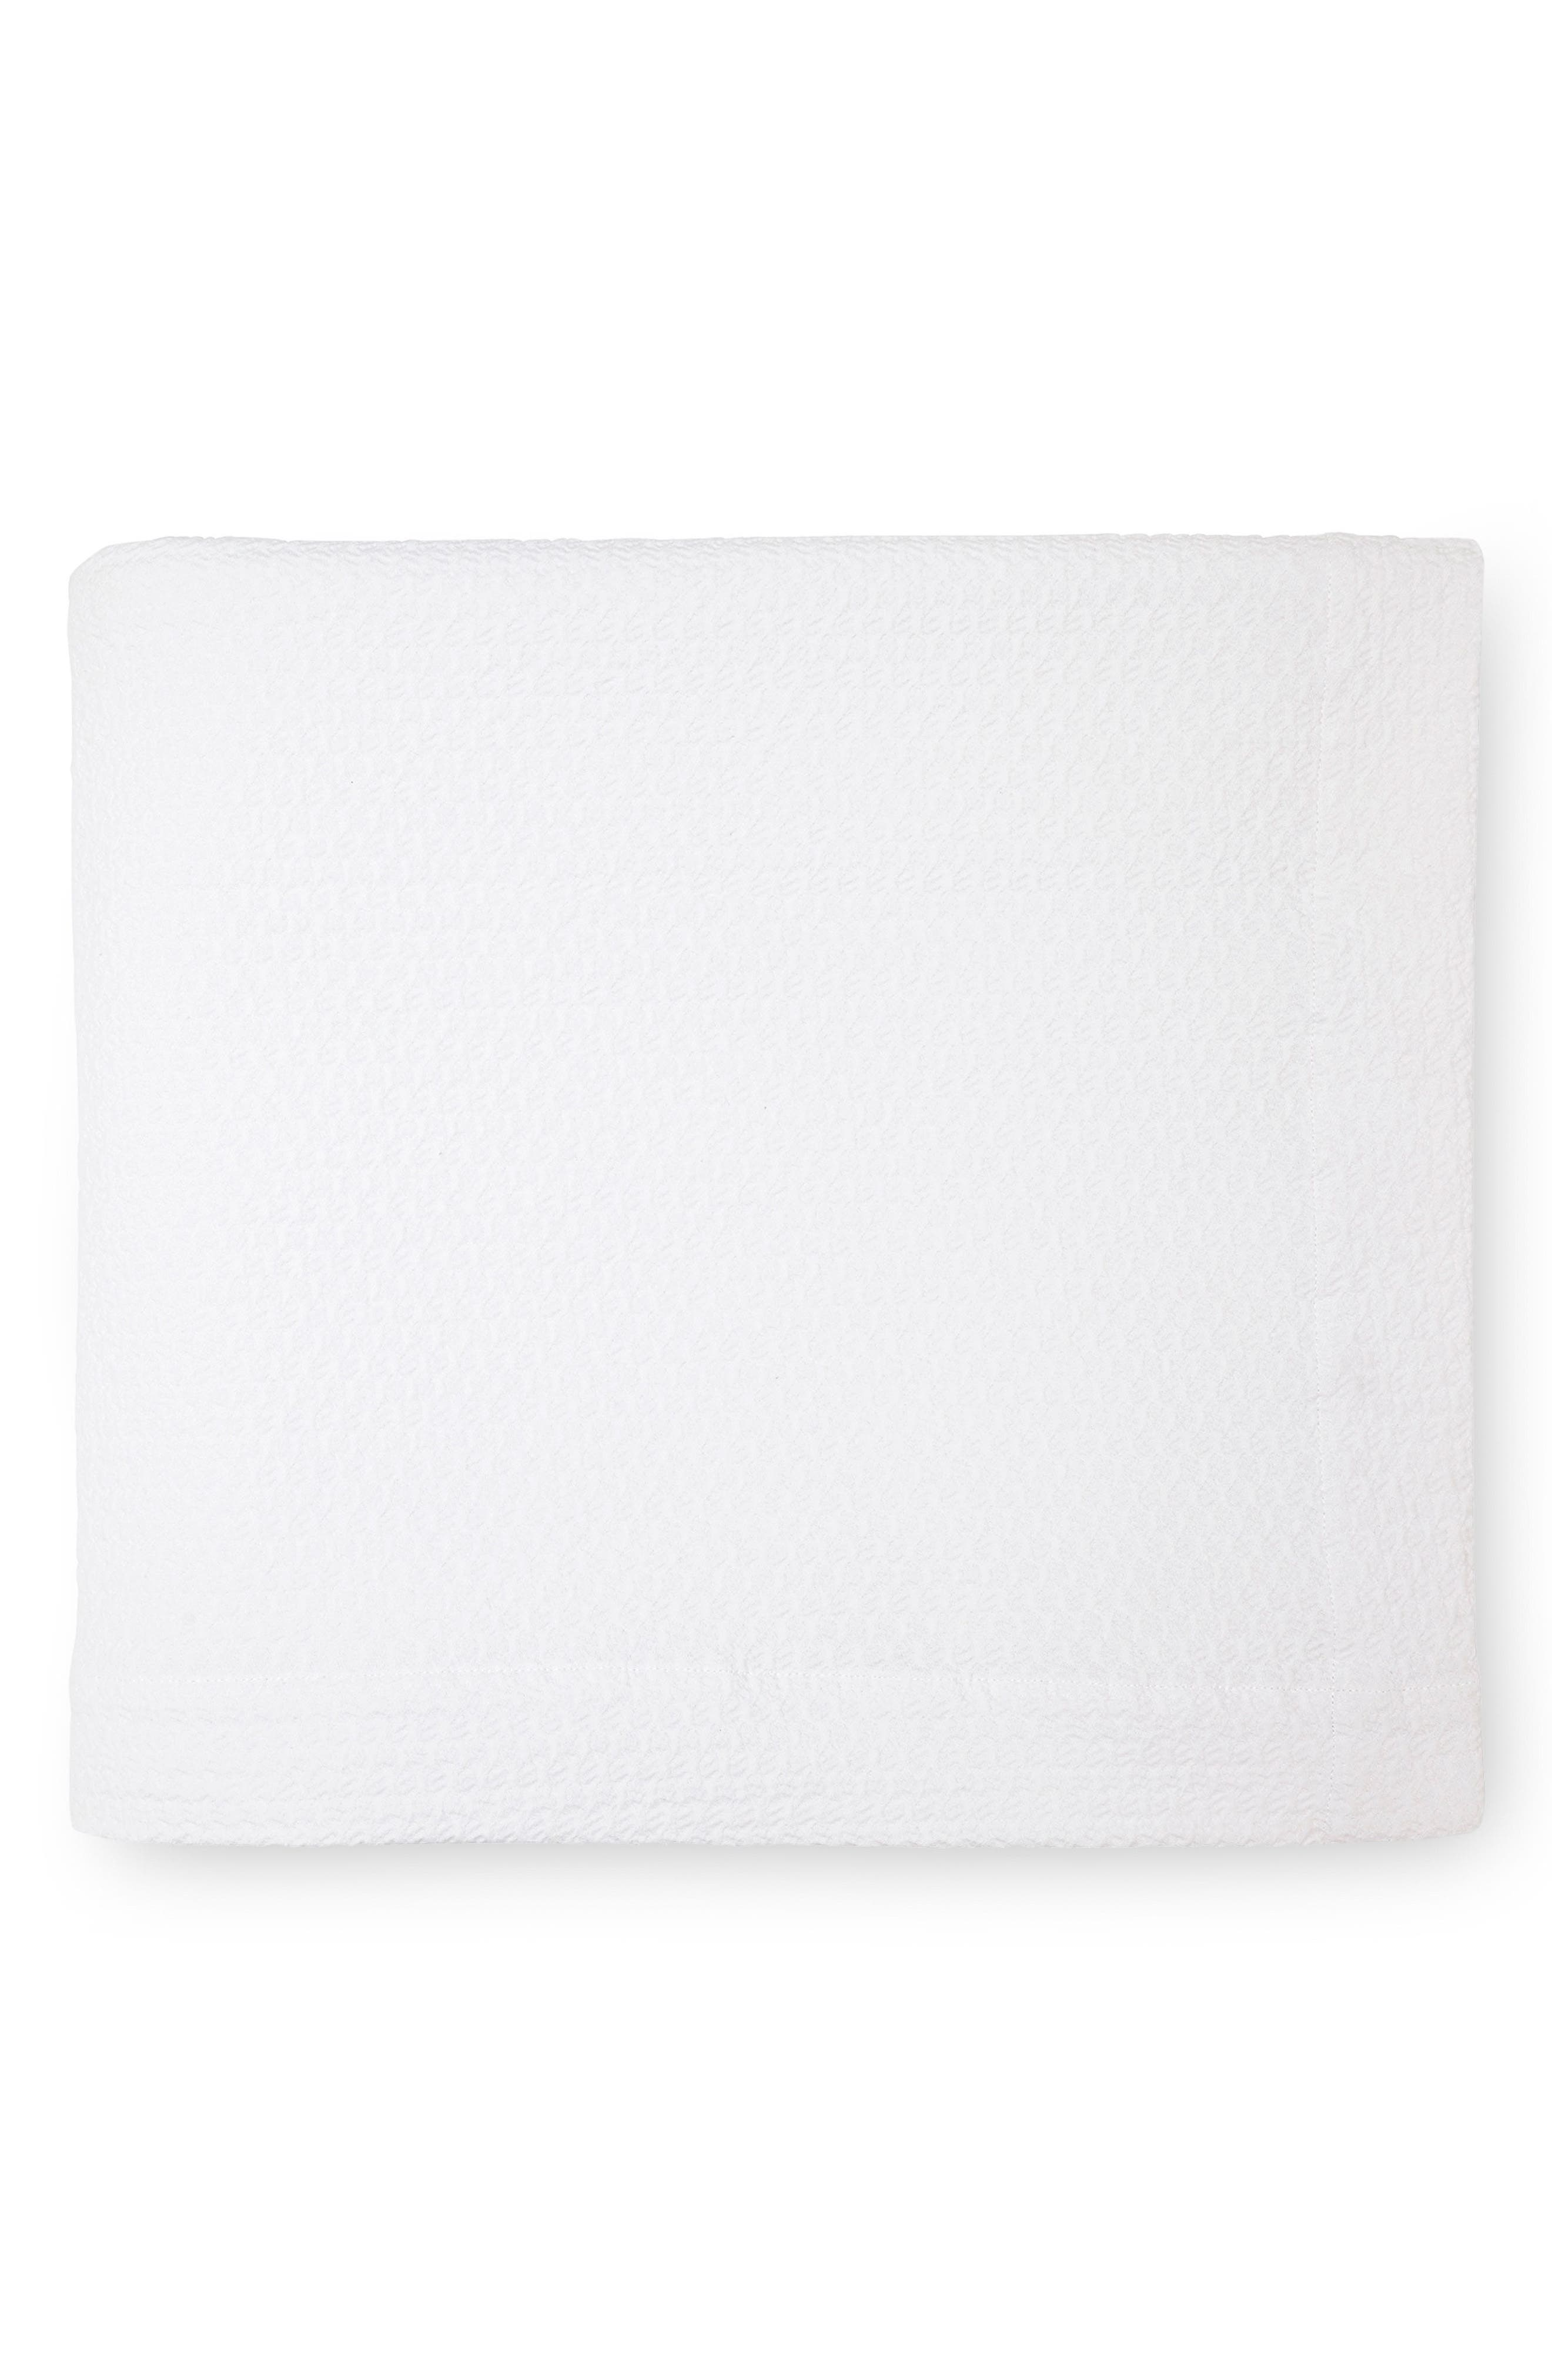 Merisso Blanket,                         Main,                         color, WHITE